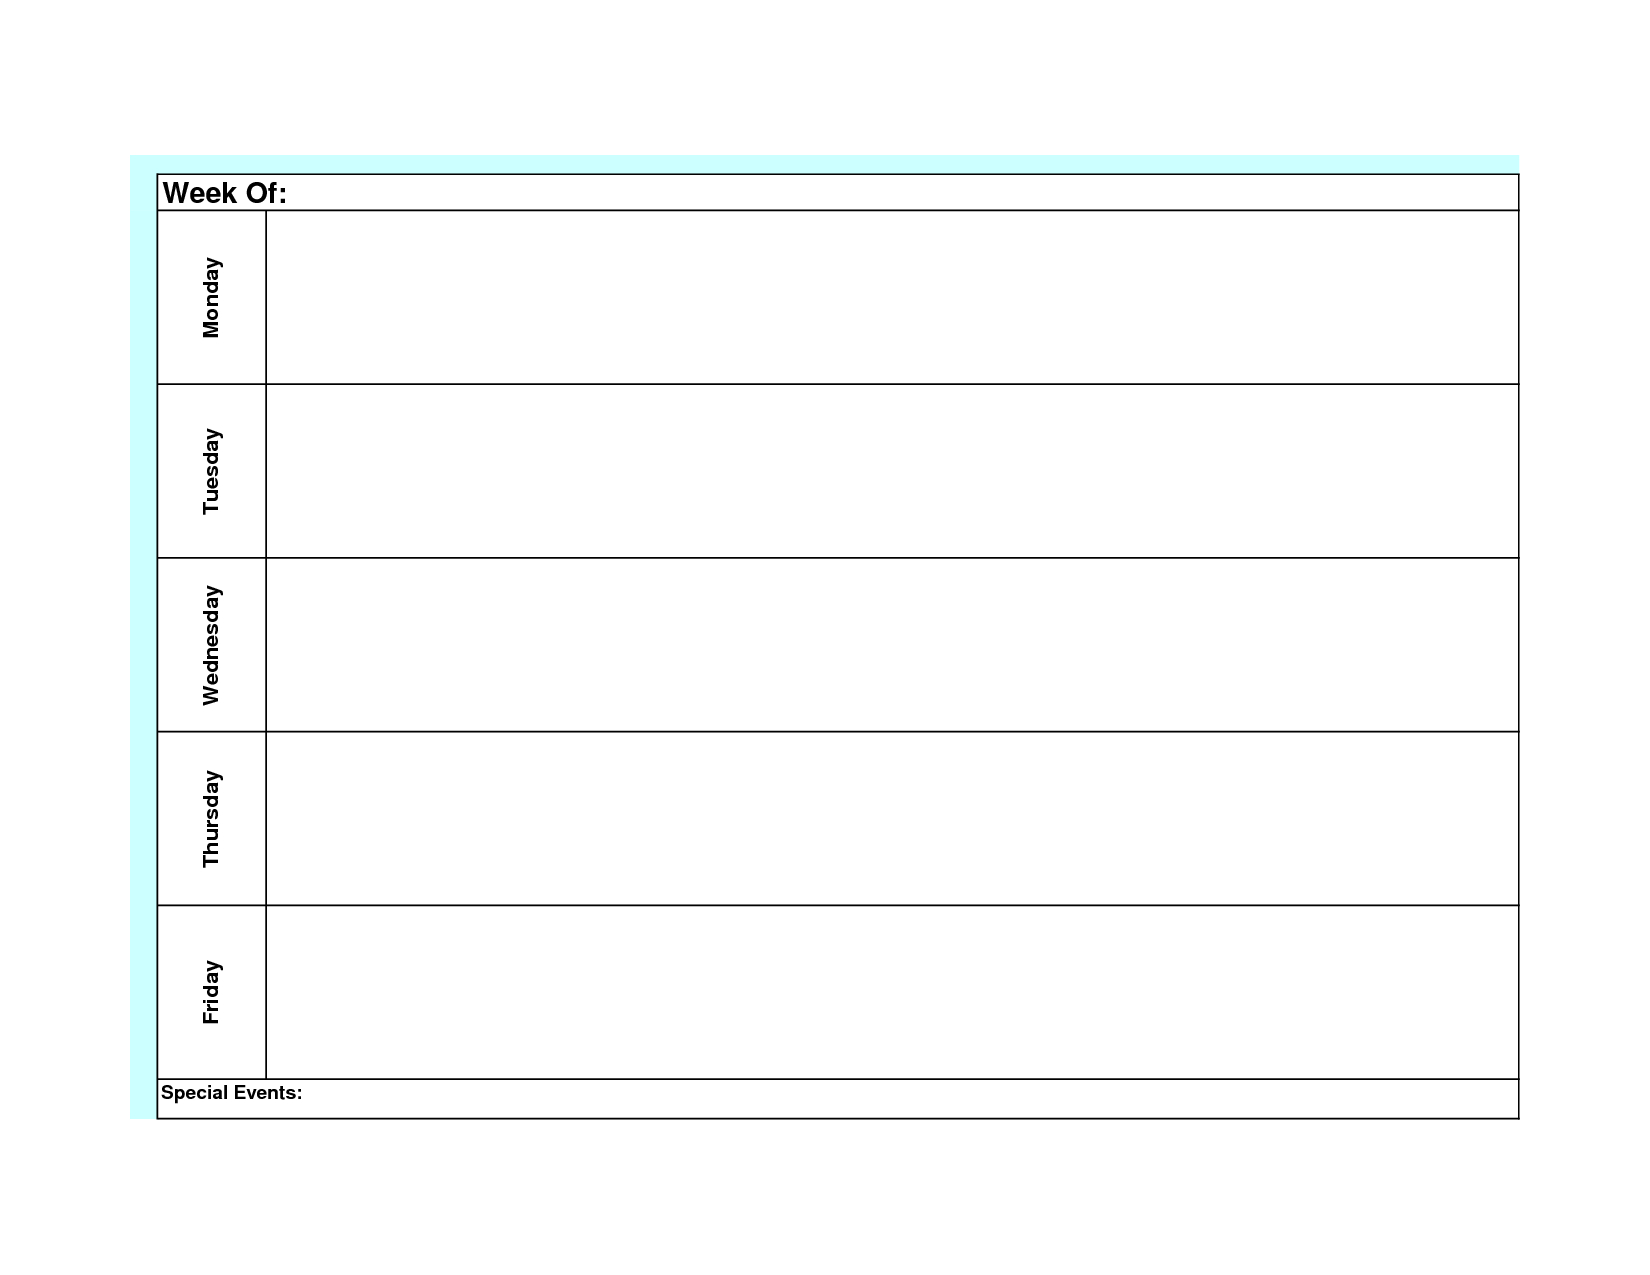 Blank Weekly Calendar Template Monday Friday | Planner | Weekly inside Blank Calendar Template Monday Friday